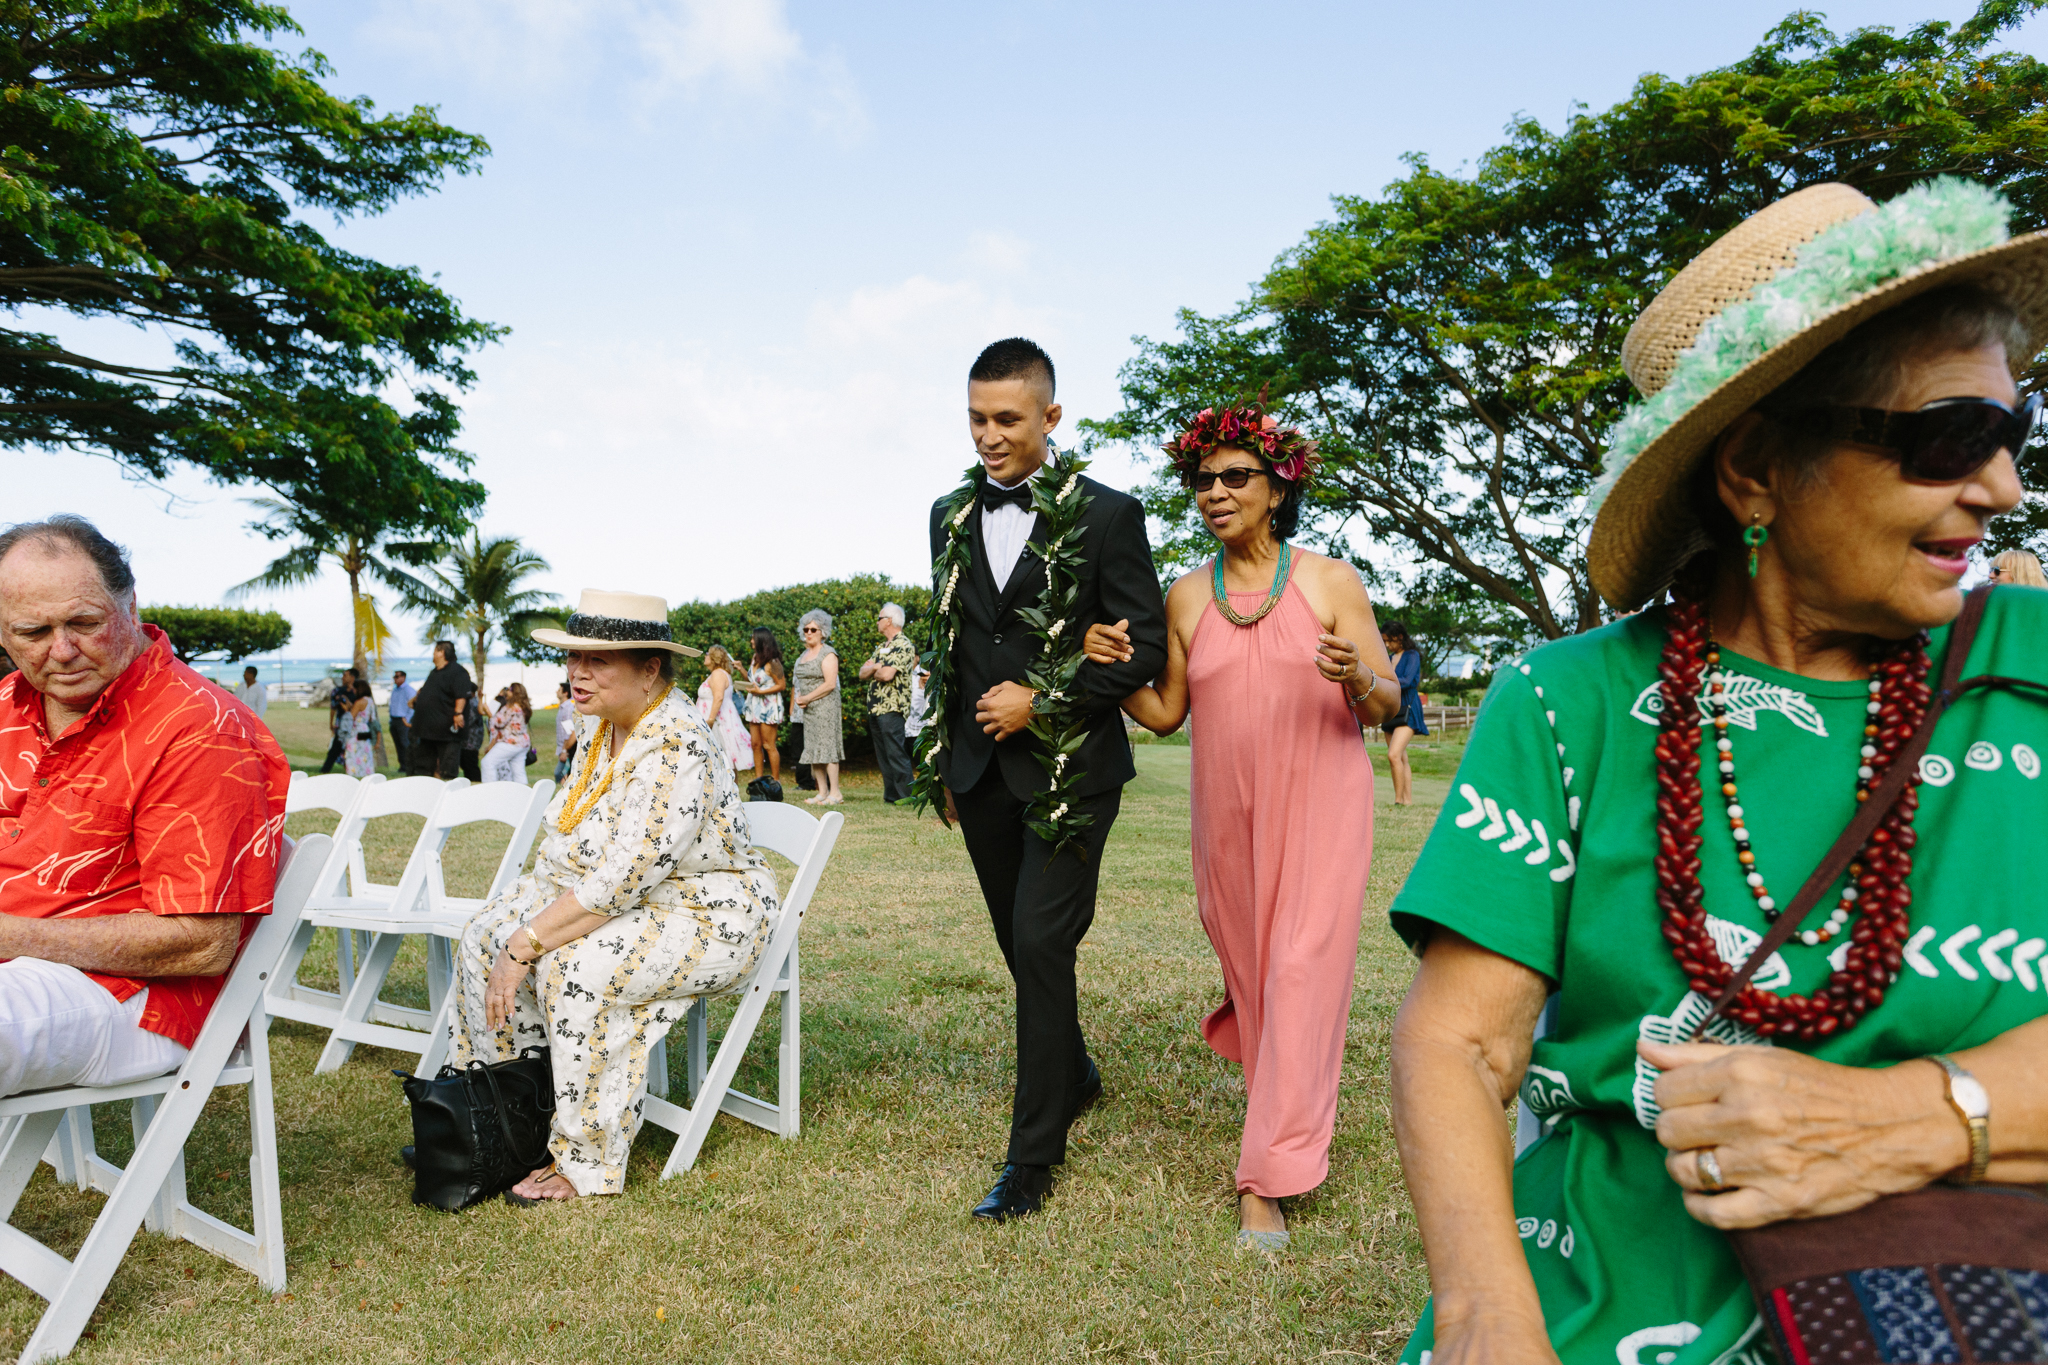 Kualoa_Ranch_Wedding_Photographer_Tone_Hawaii-14.jpg